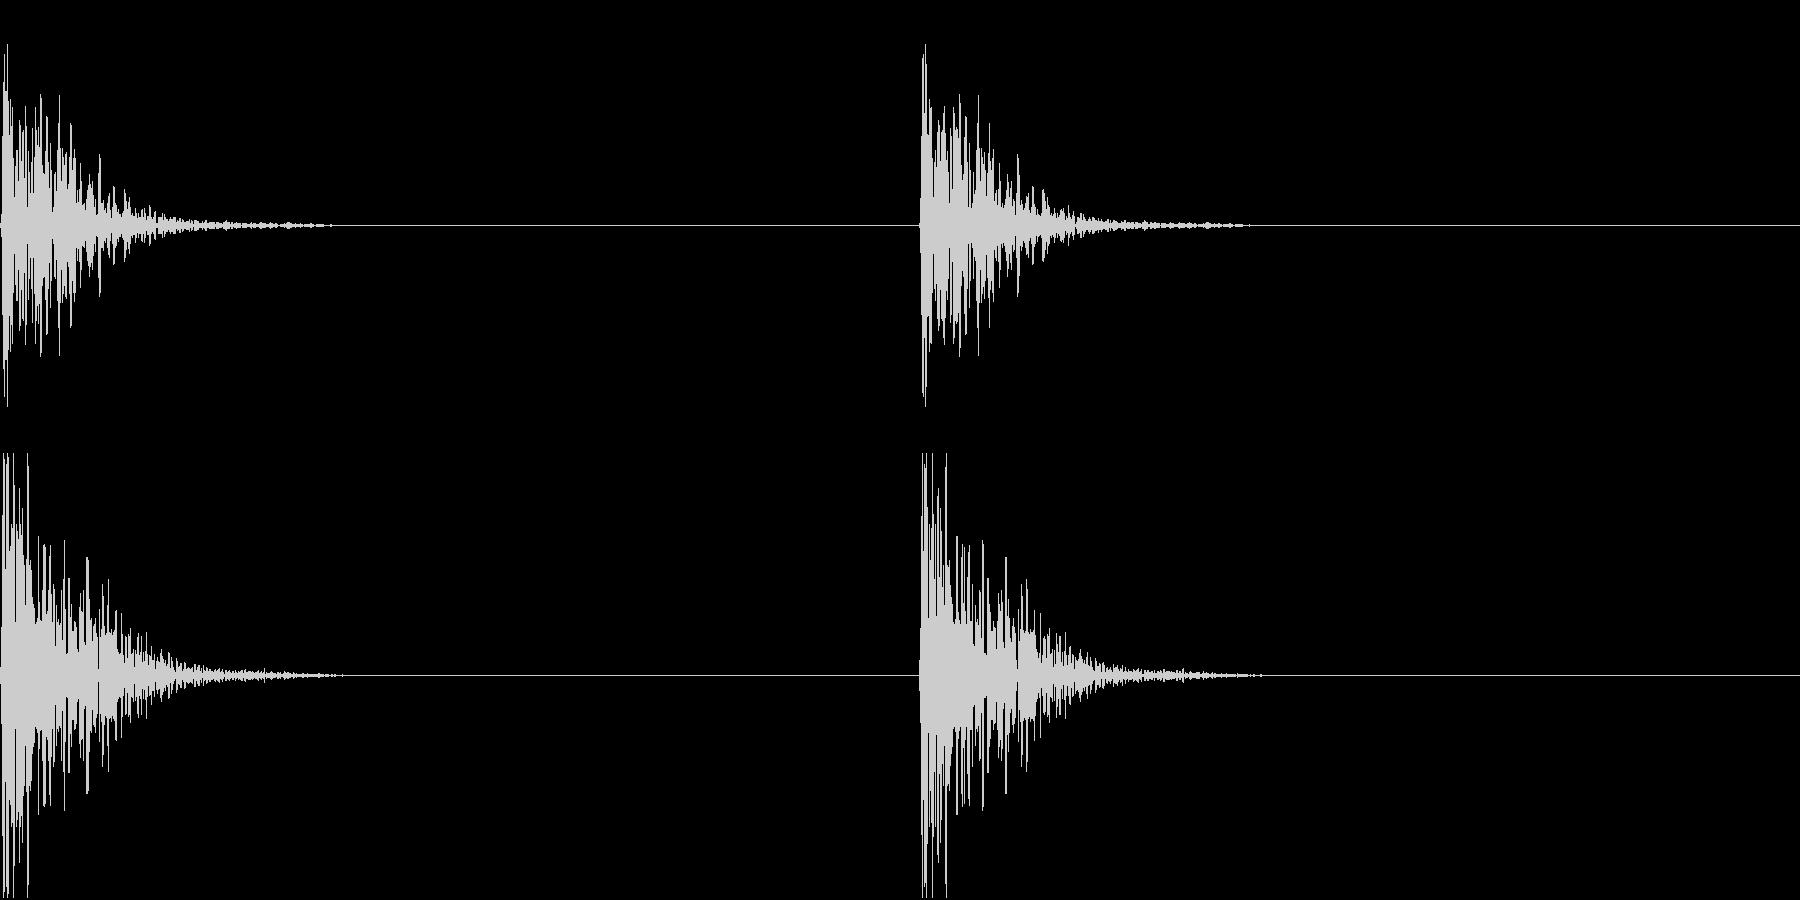 DIY 釘を打つ金槌の音 コンコンの未再生の波形